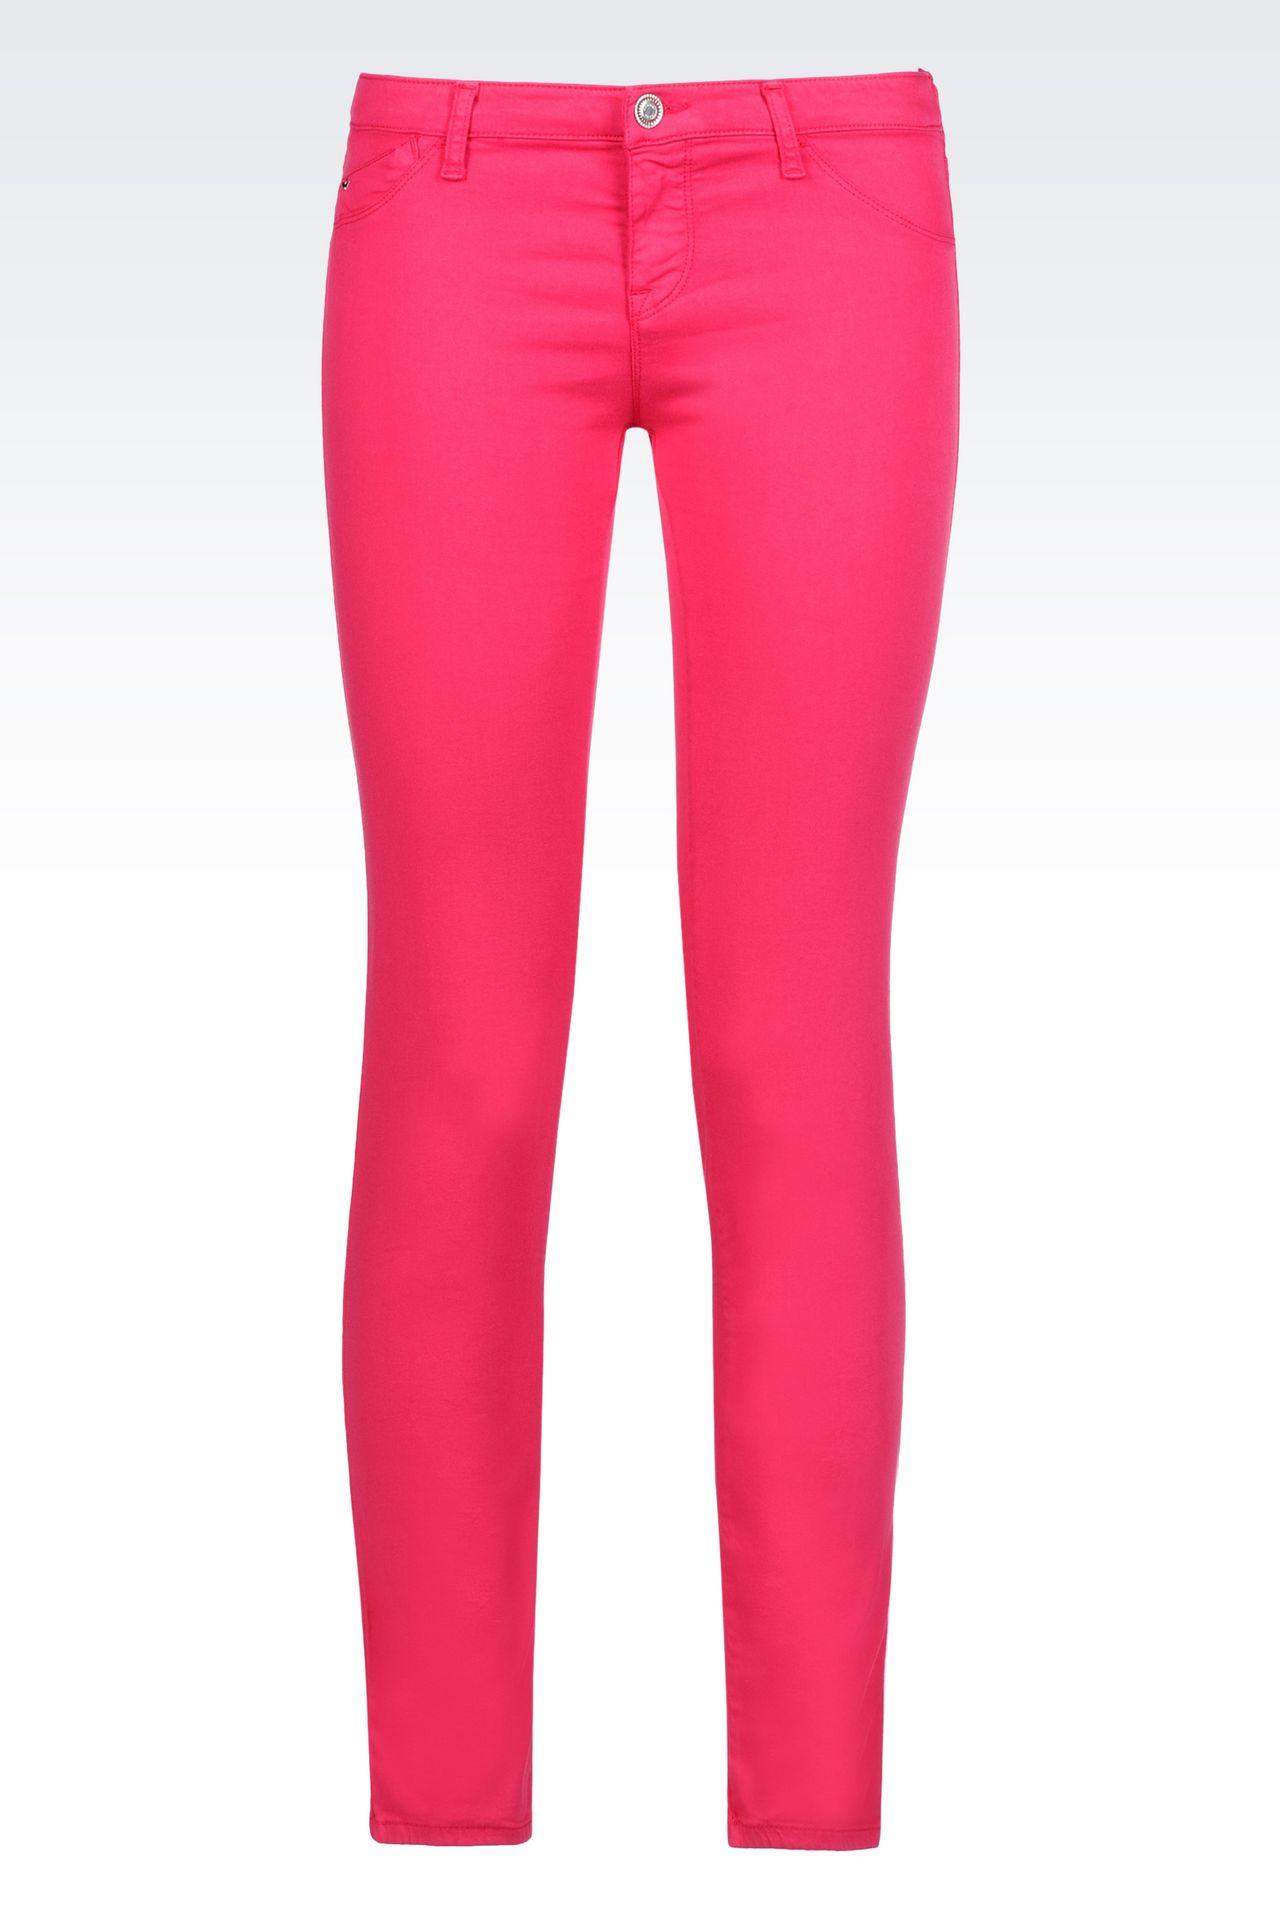 SKINNY FIT 5-POCKET TROUSERS IN MODAL BLEND: Jeans Women by Armani - 0